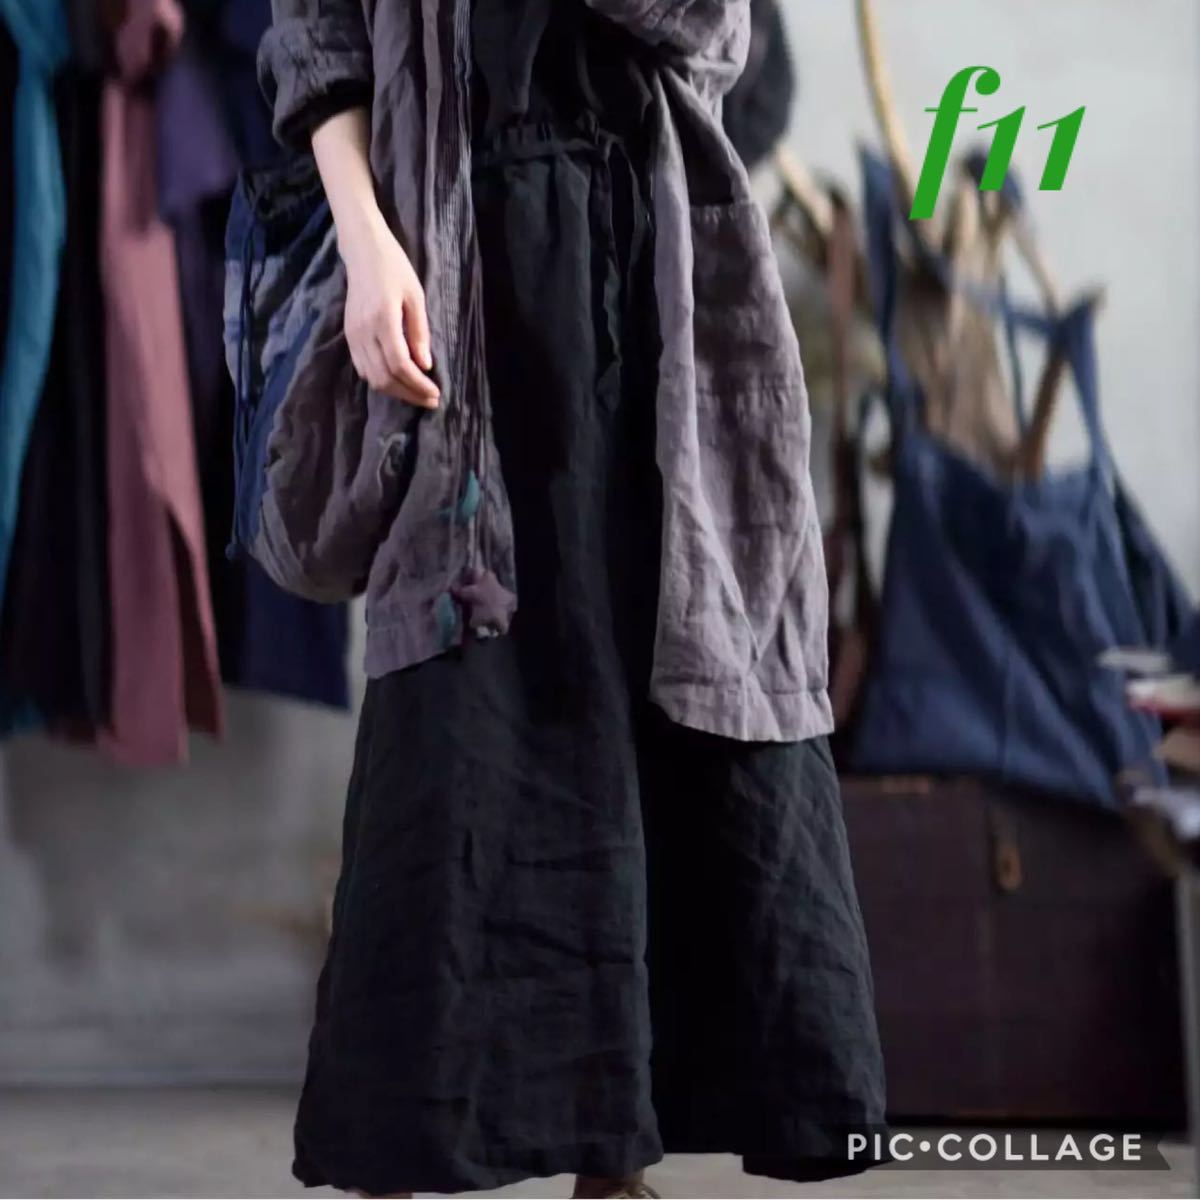 f11 新品 送料無料 レディース リネン 麻100% ロングスカート シンプル ナチュラル ゆったり リネンスカート ブラック 黒色 秋 冬 M